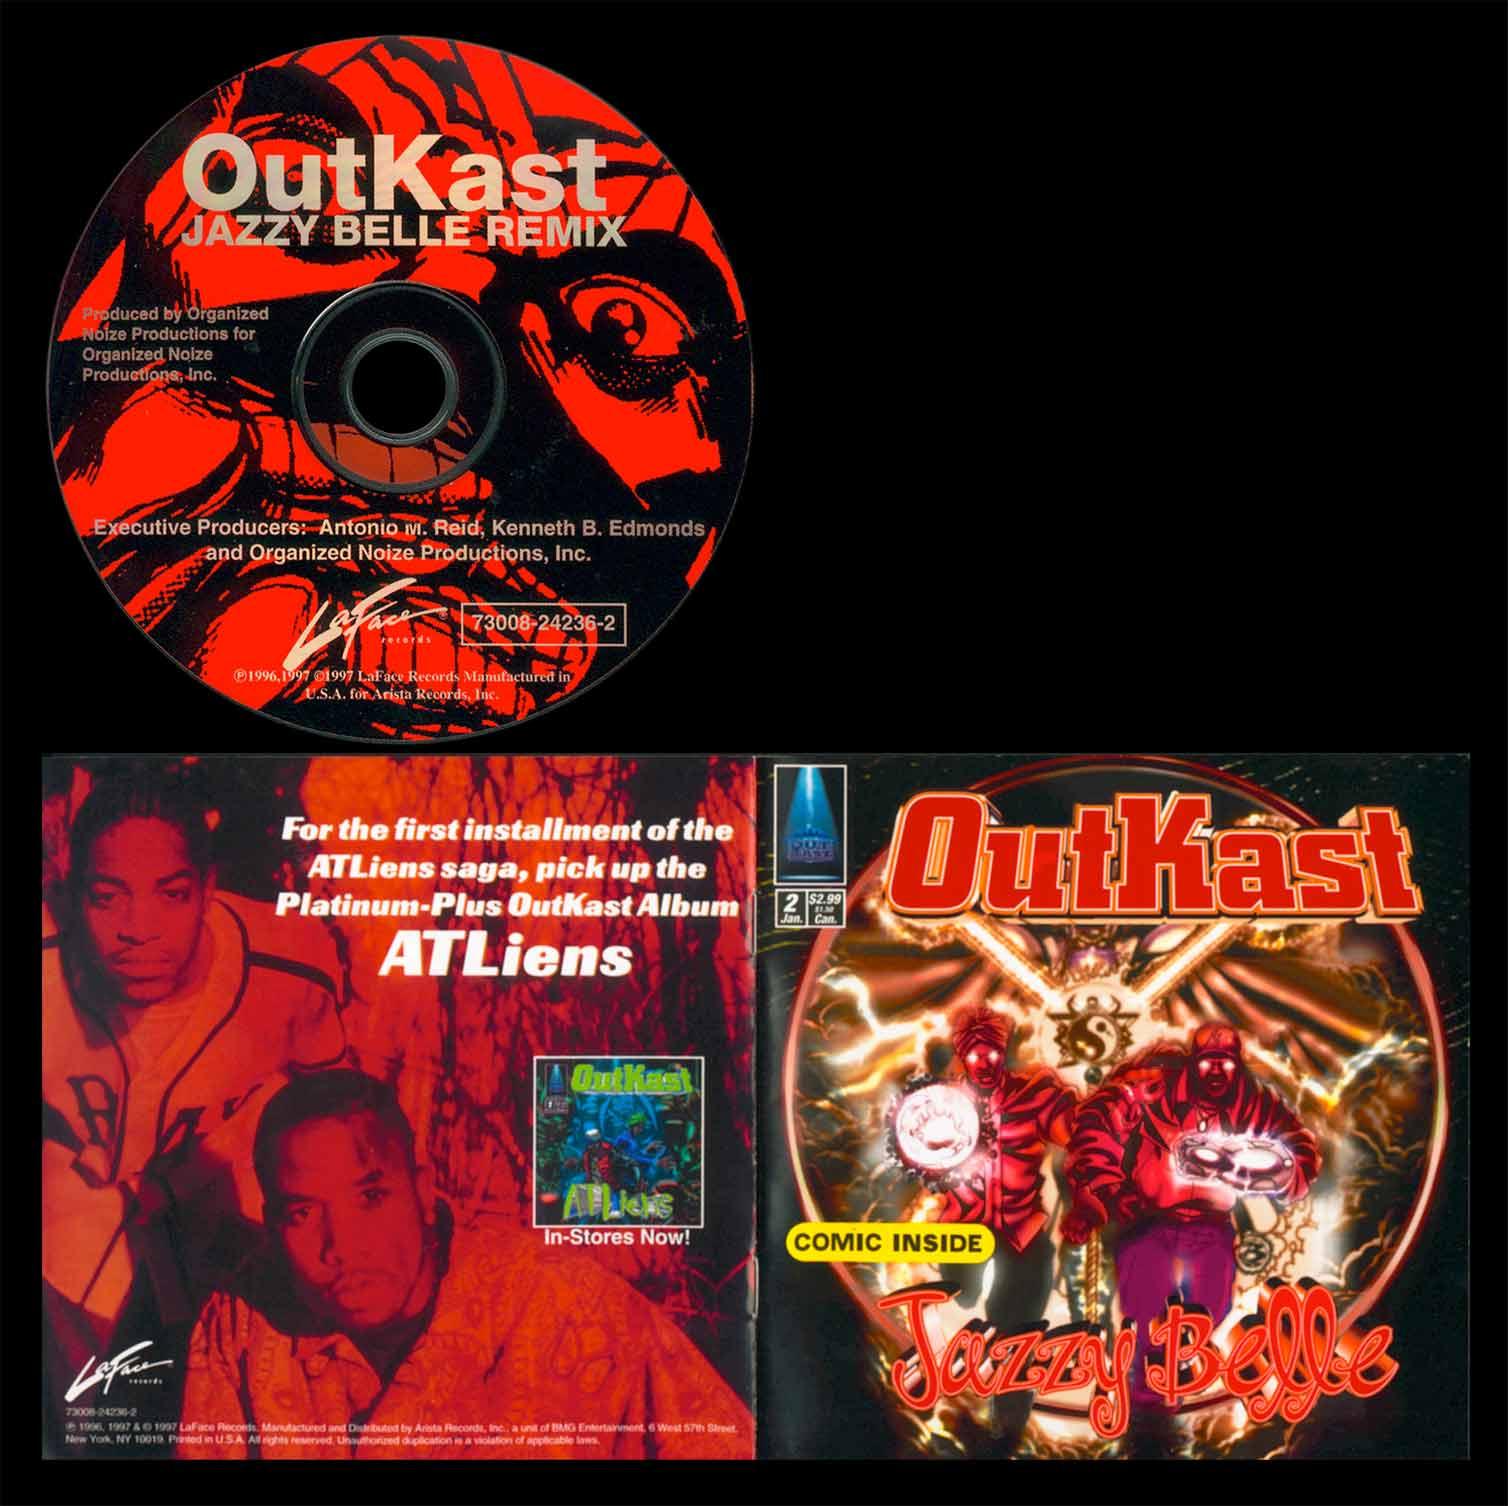 Designed single album cover / CD / Comic Book / for Grammy Award Winning Artist OutKast.